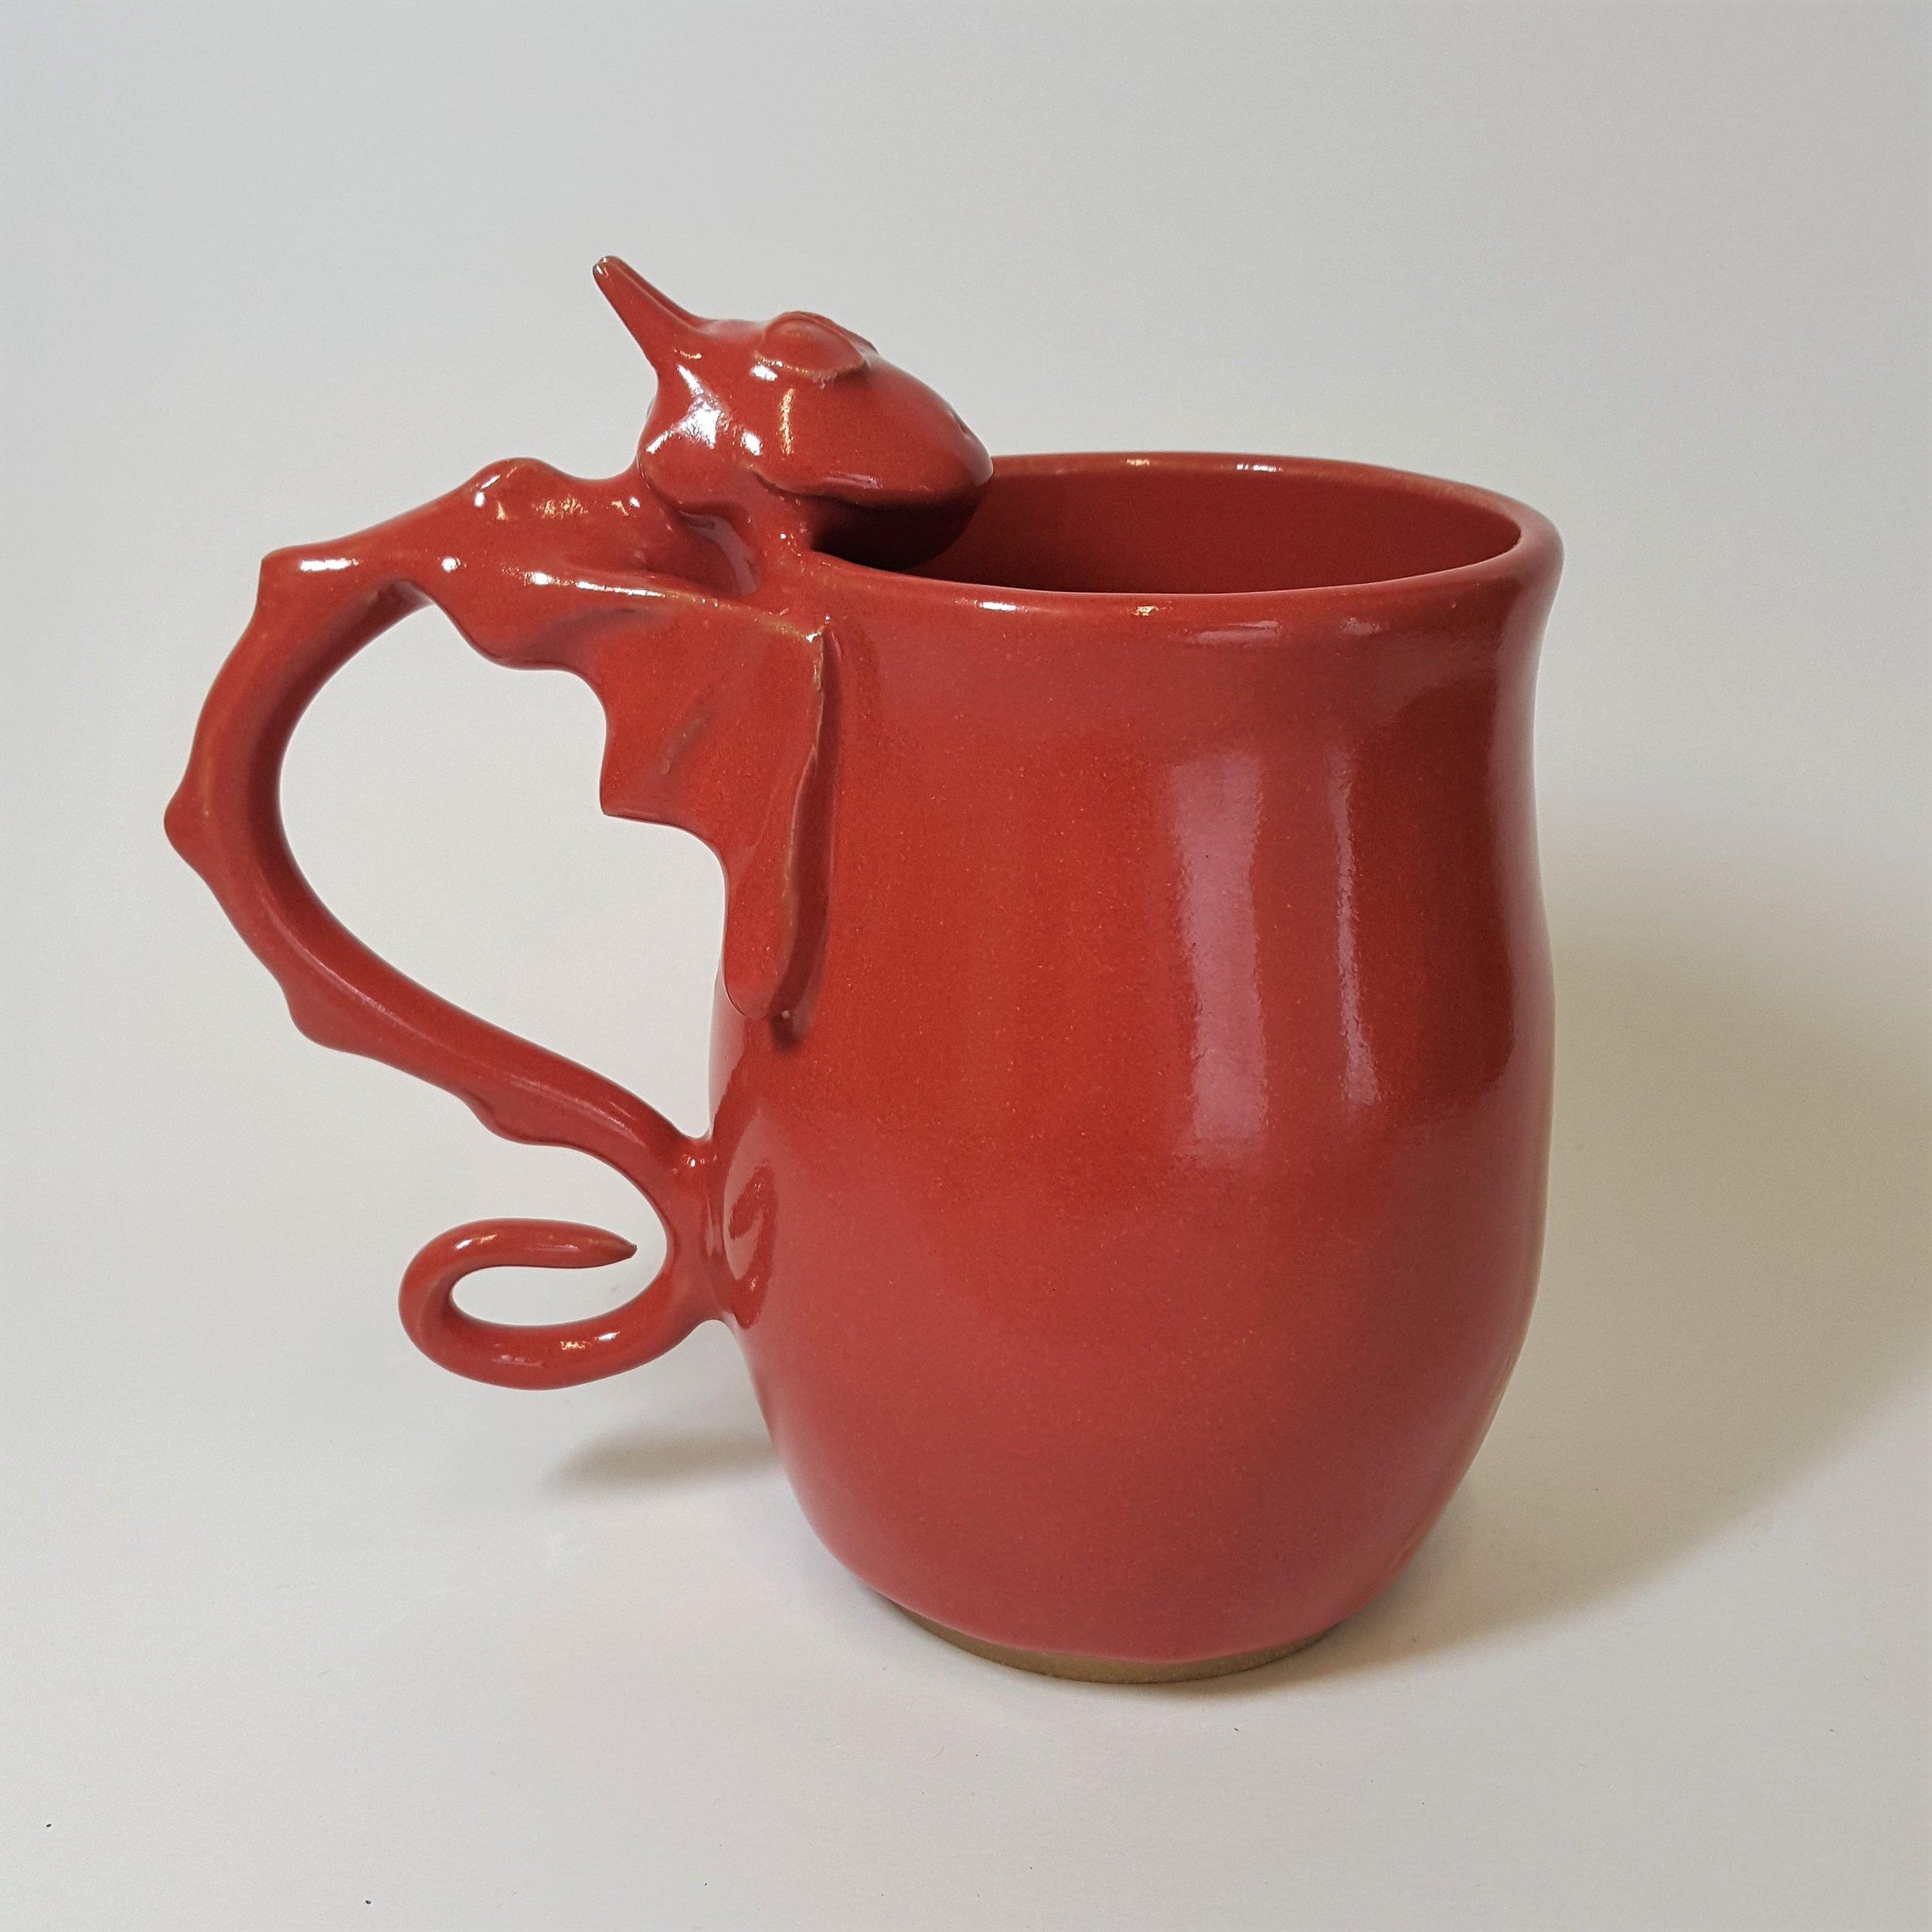 22 oz. Red Dragon Mug - $65